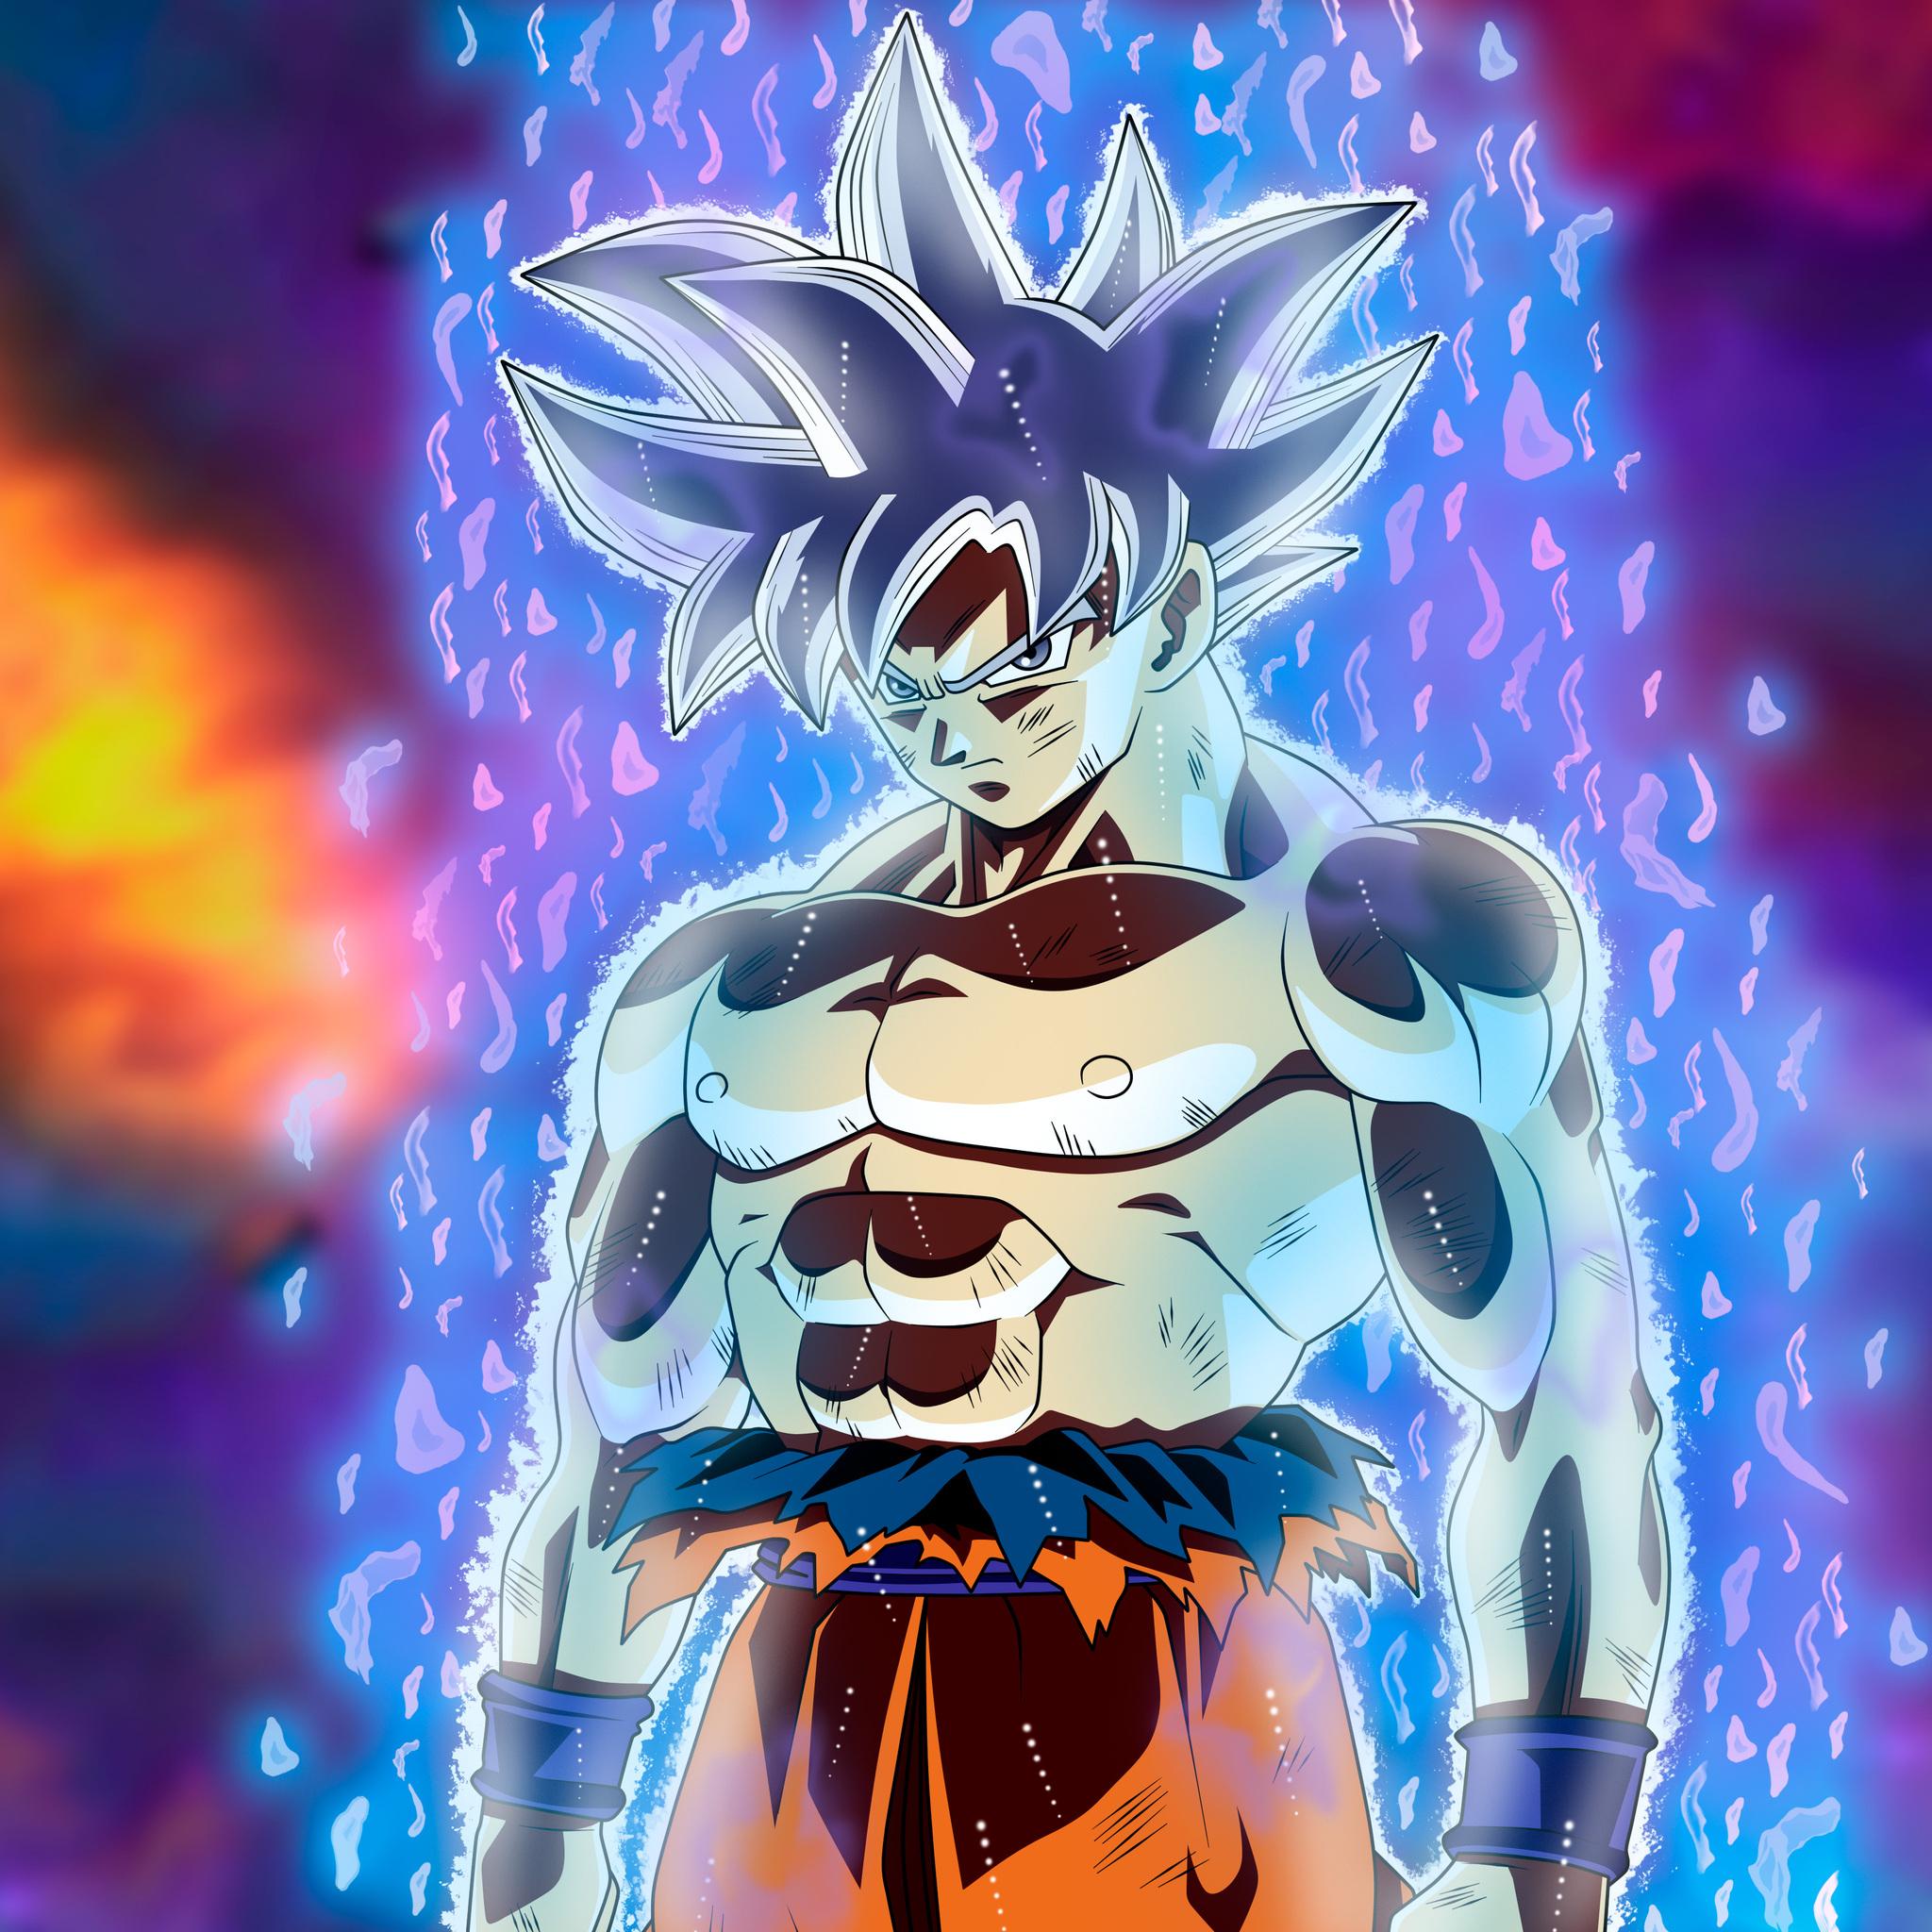 4k Wallpaper Dragon Ball: 2048x2048 Goku Migatte No Gokui Perfecto Ultra Instinct